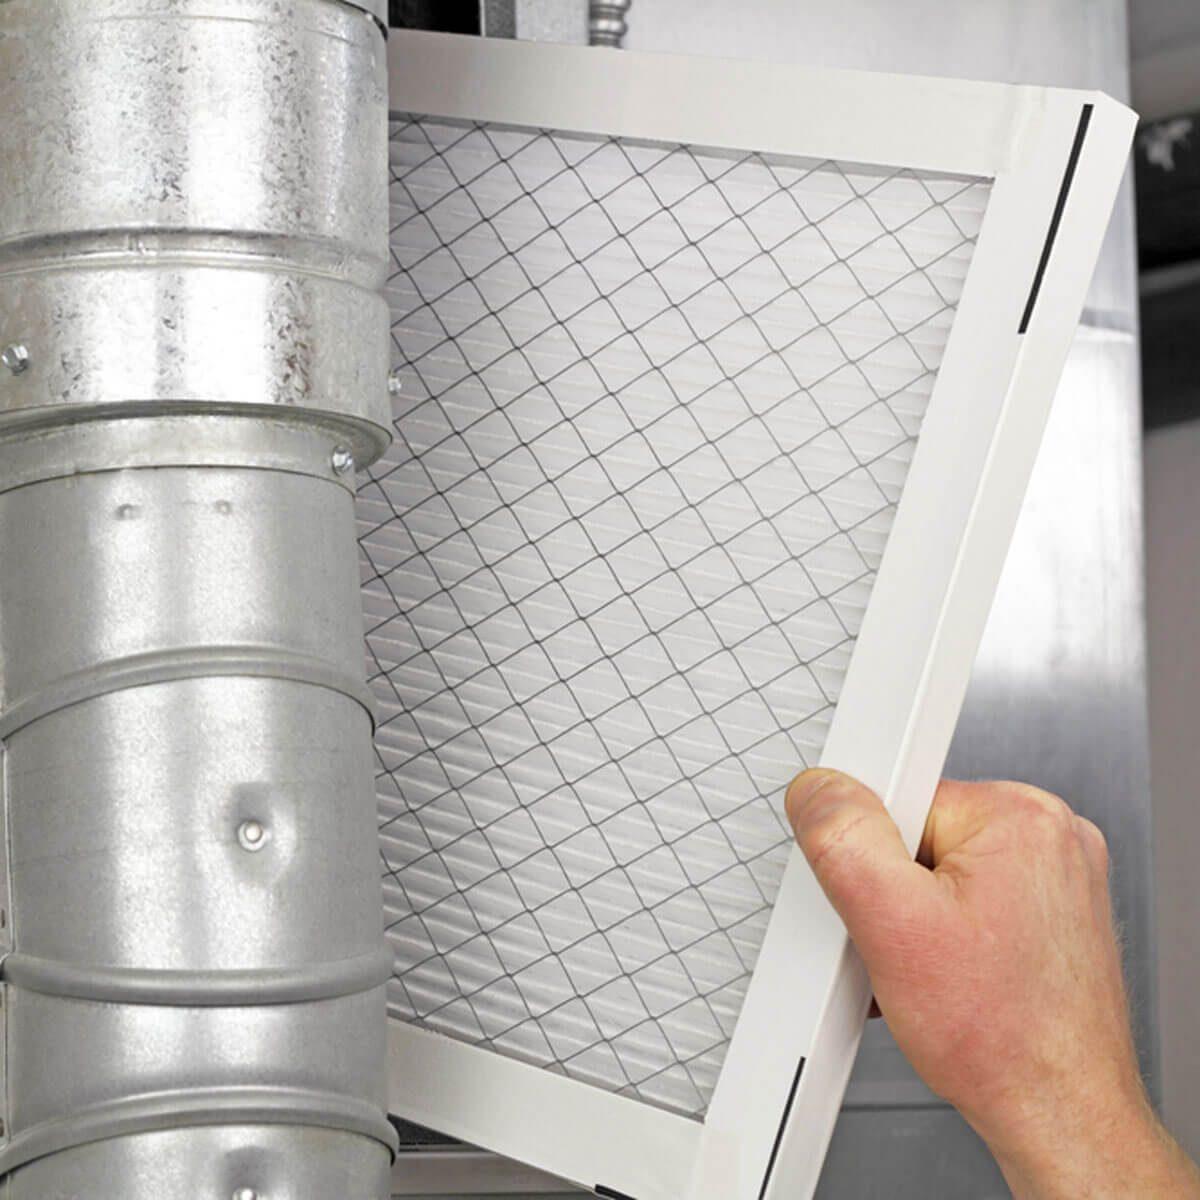 dfh5_shutterstock_73233349 change furnace filter